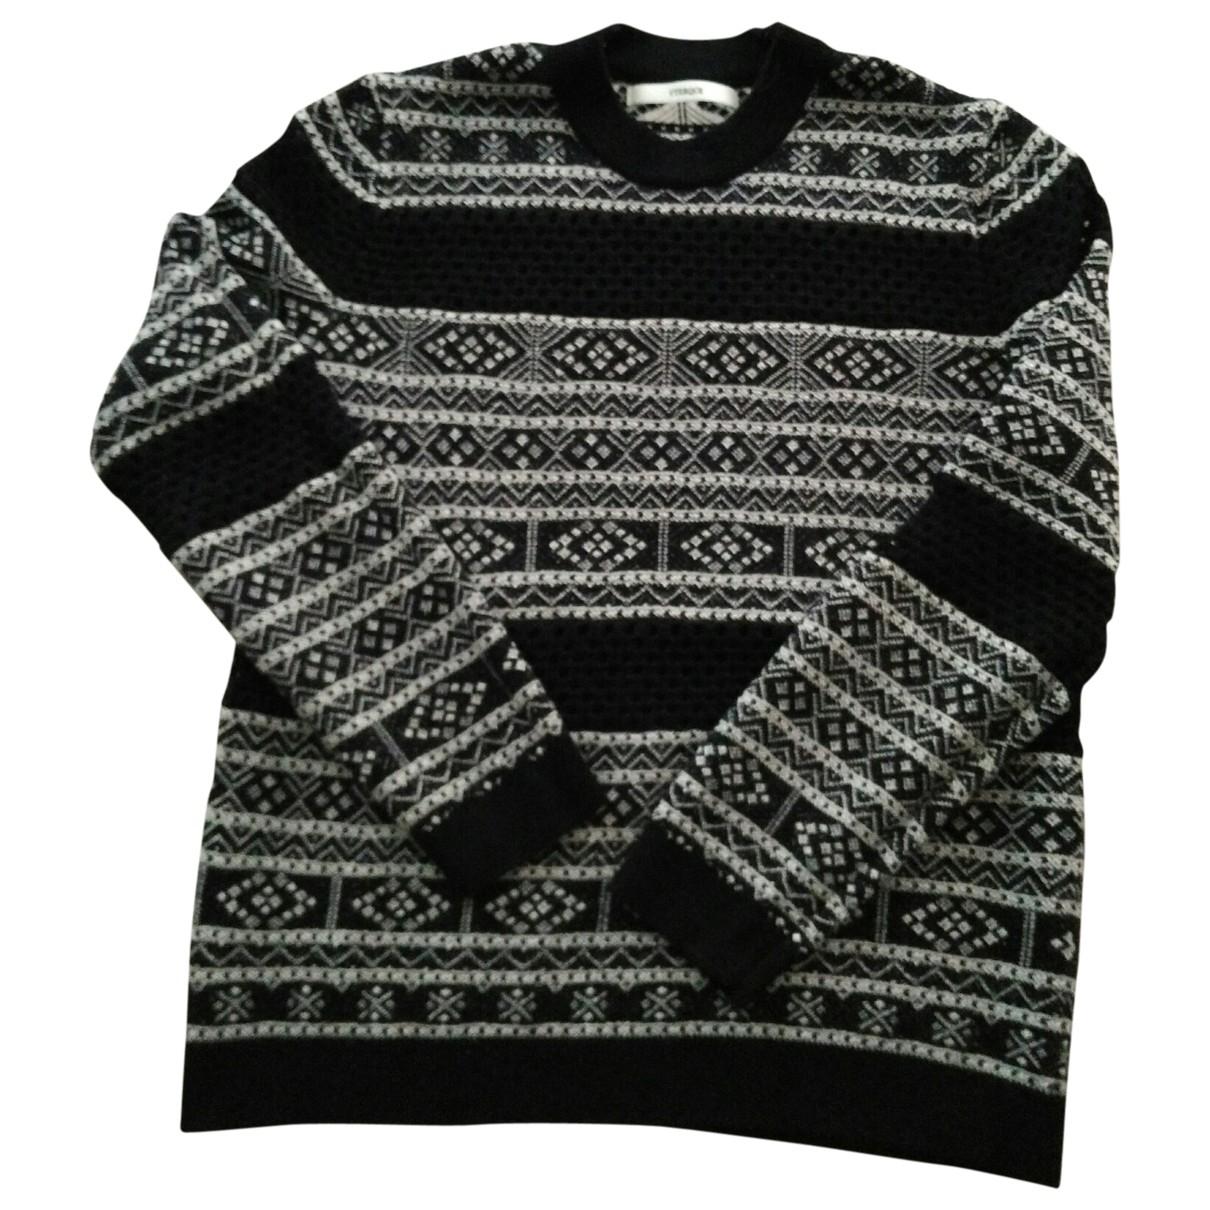 Uterque \N Black Knitwear for Women S International